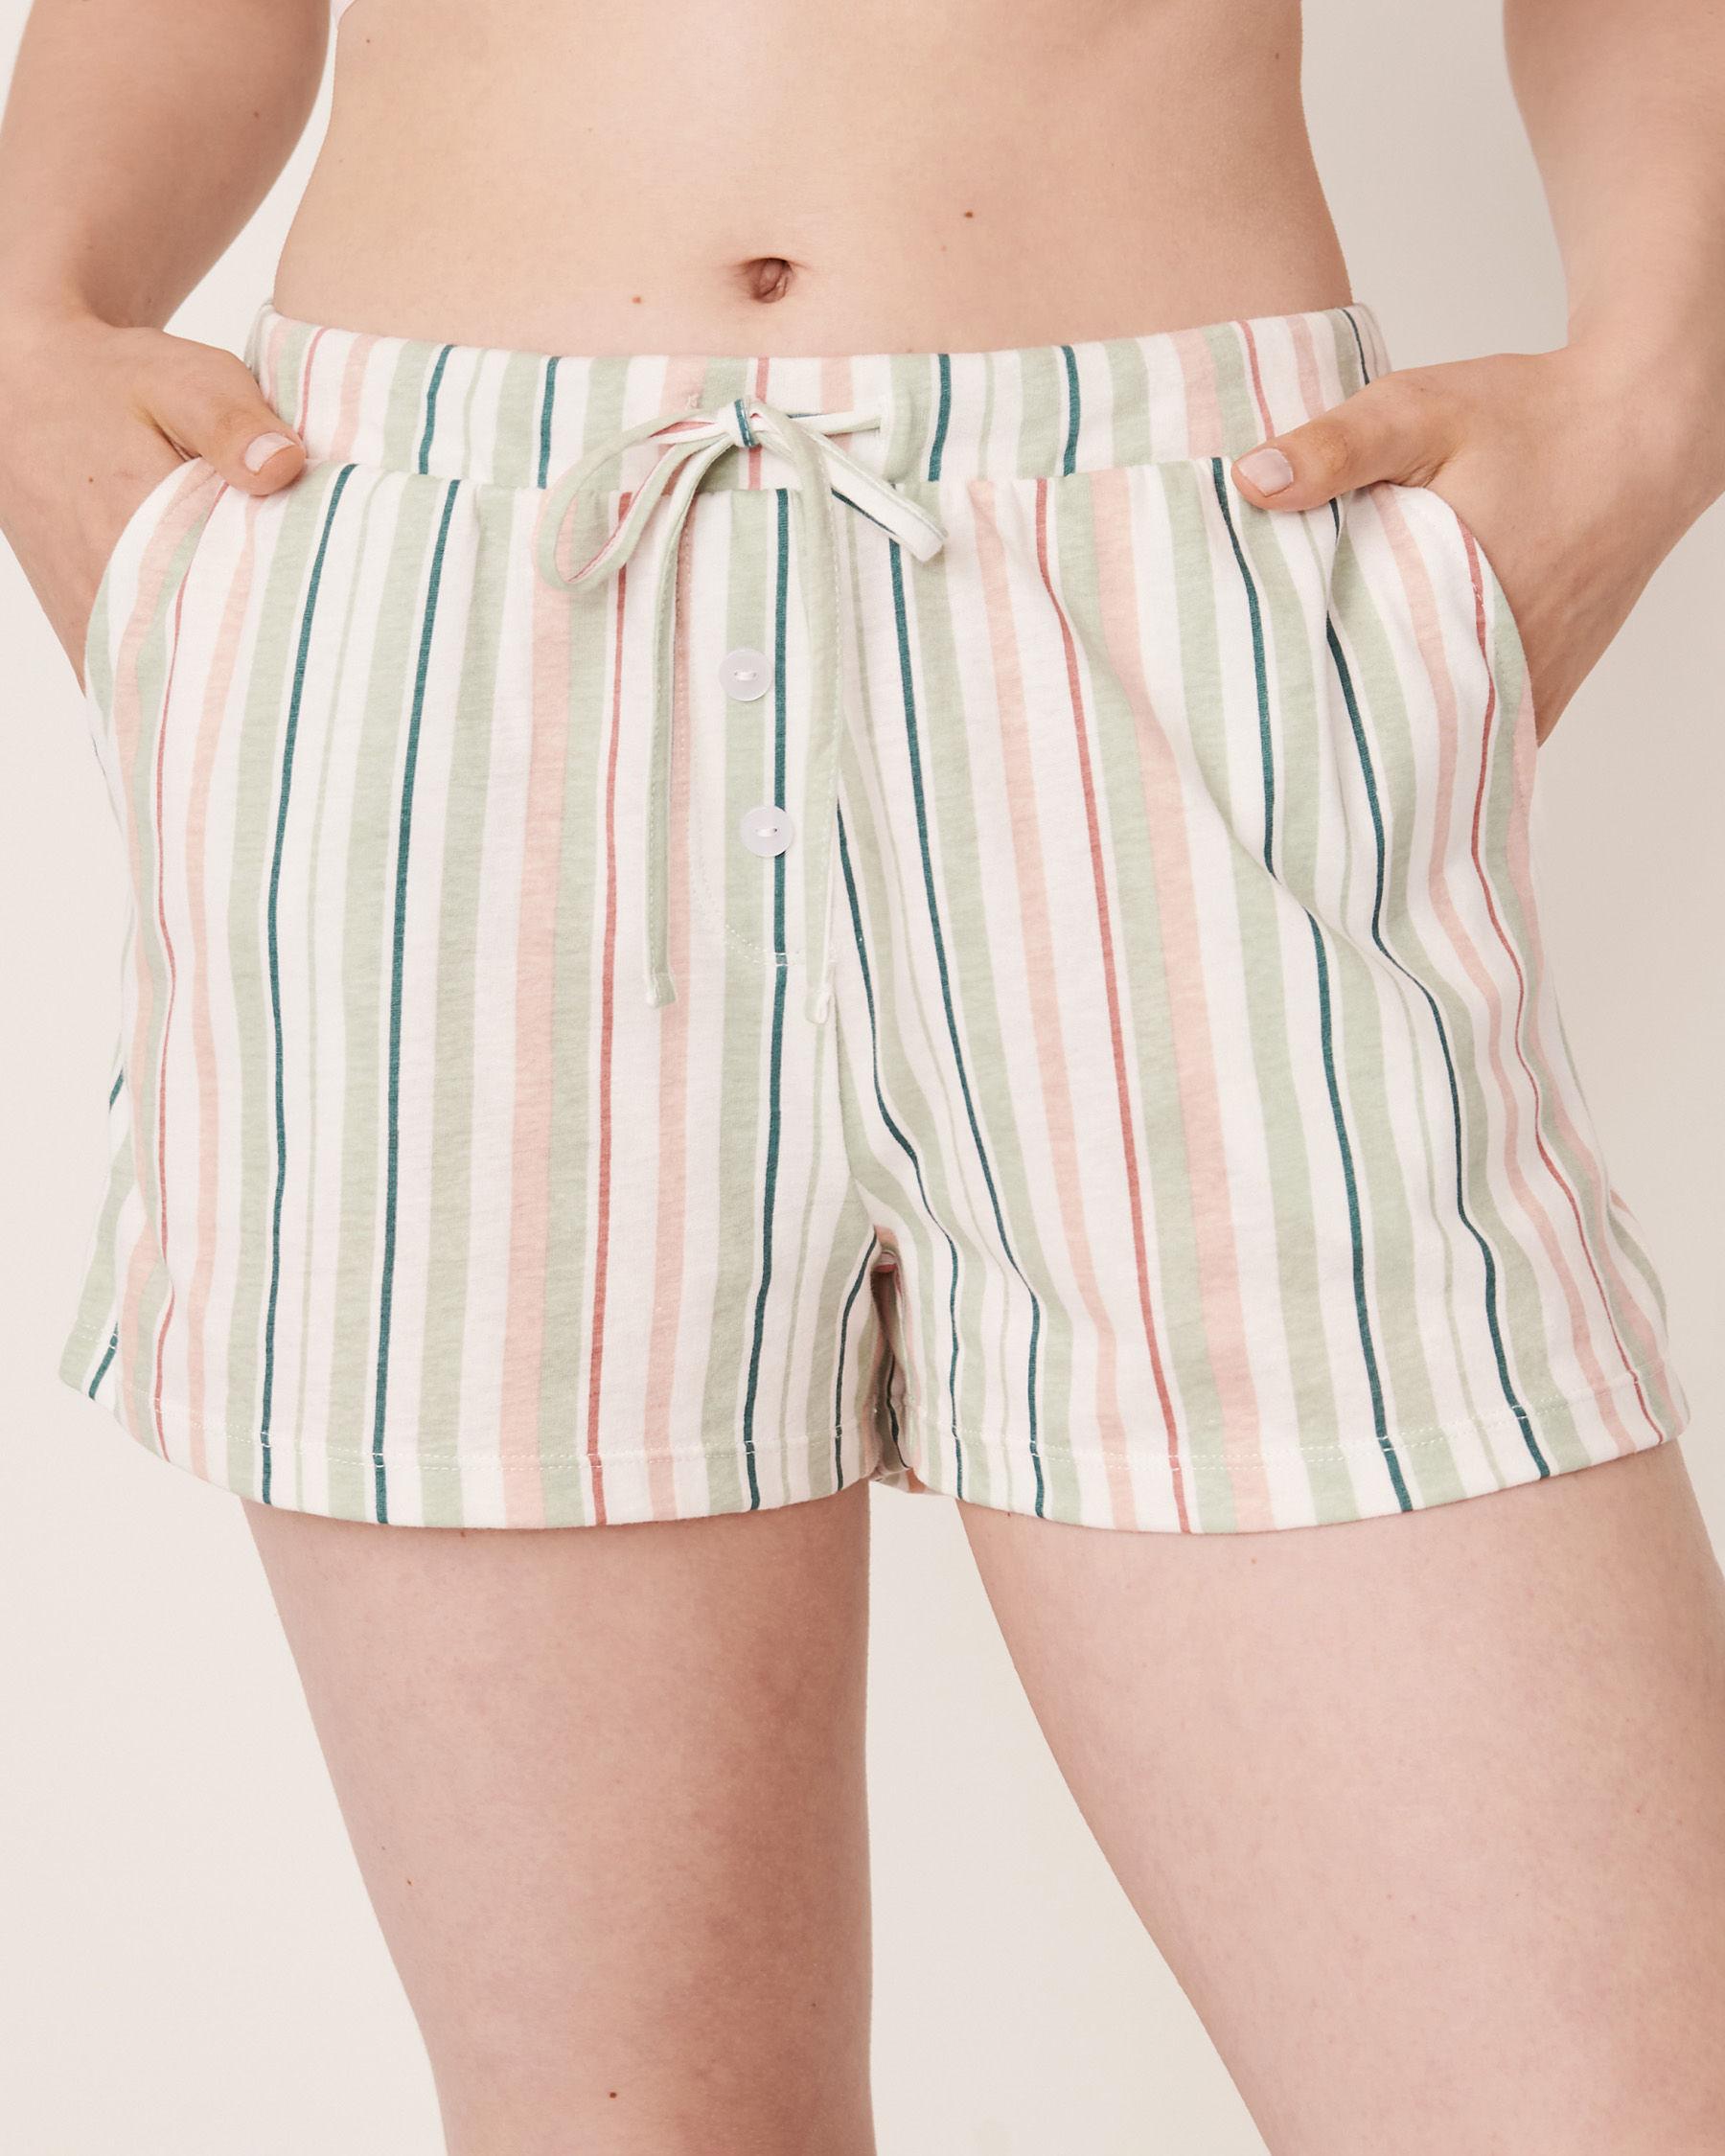 LA VIE EN ROSE Pyjama Short with Pockets Multi stripes 40200090 - View1